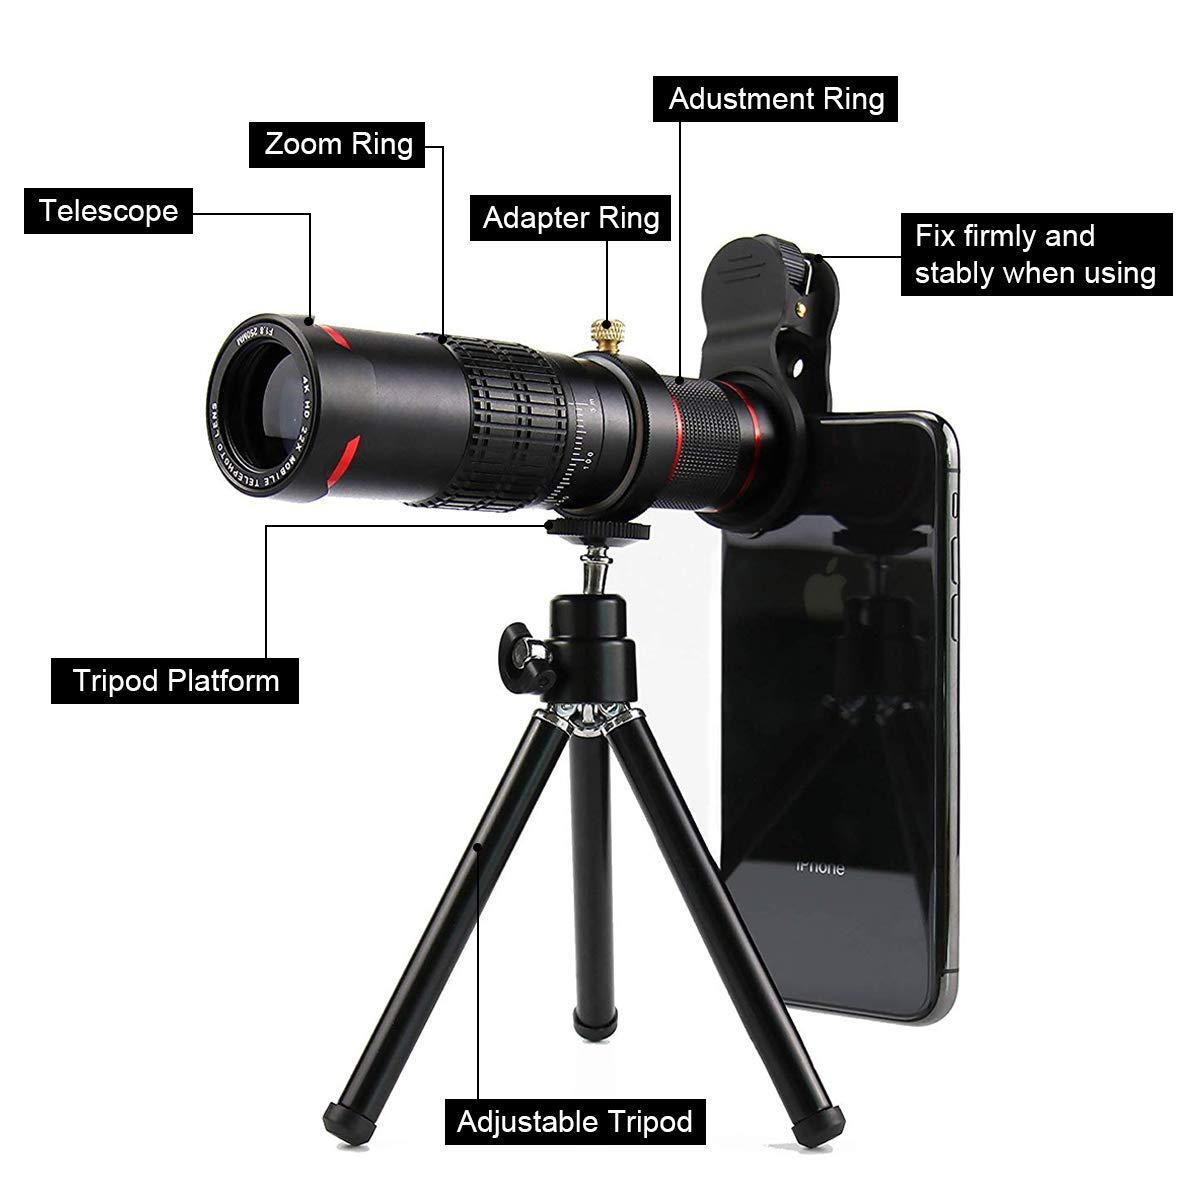 Cell Phone Camera Lens,Phone Photography Kit-Flexible Phone Tripod +Remote Shutter +4 in 1 Lens Kit-High Power 22X Monocular Telephoto Lens, Fisheye, Macro & Wide Angle Lens for Smartphone (Black) by Bamoer (Image #2)